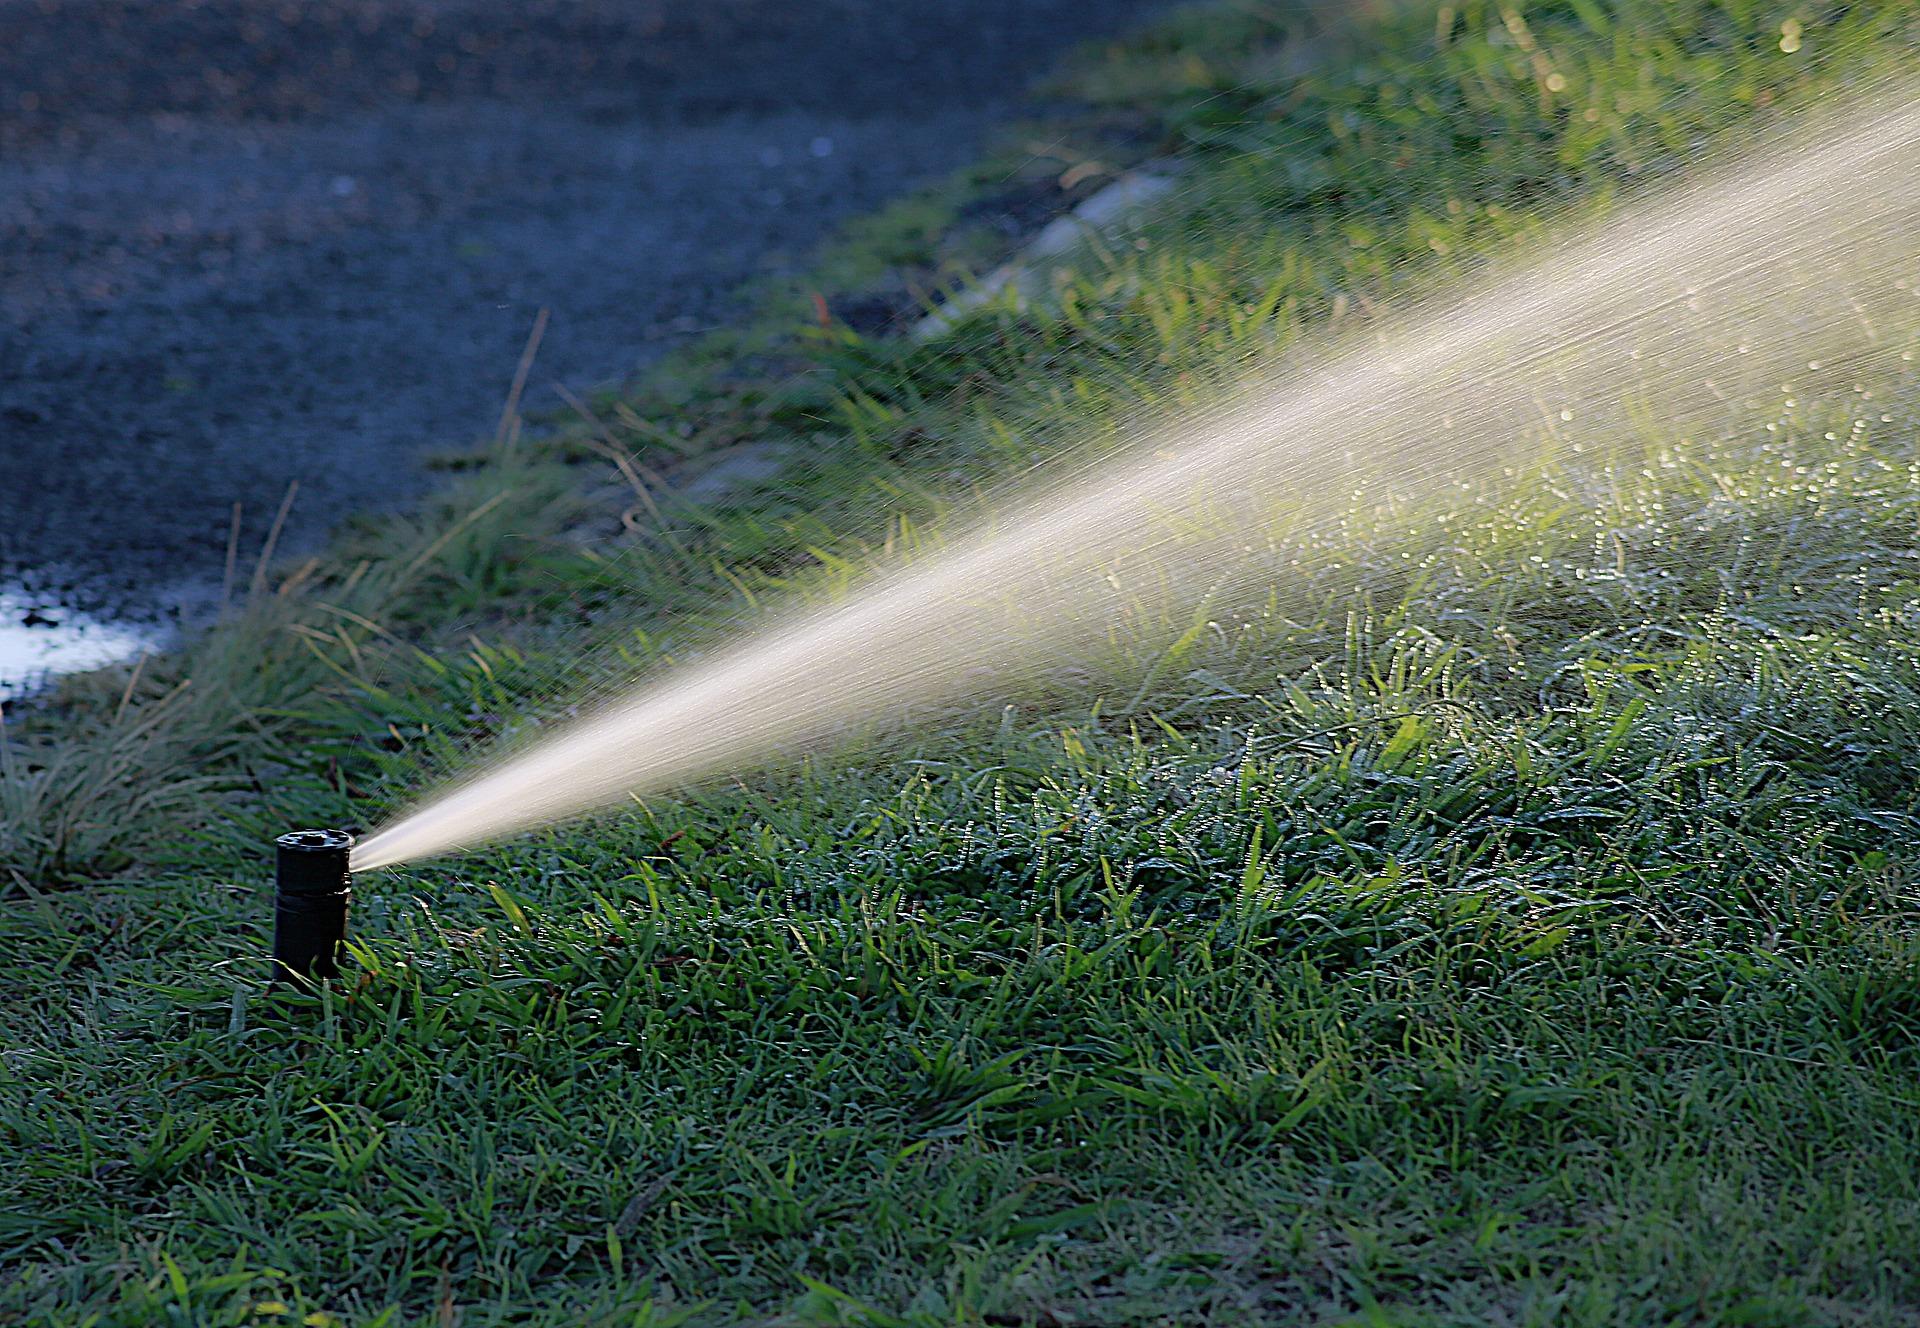 Sprinkler head irrigation